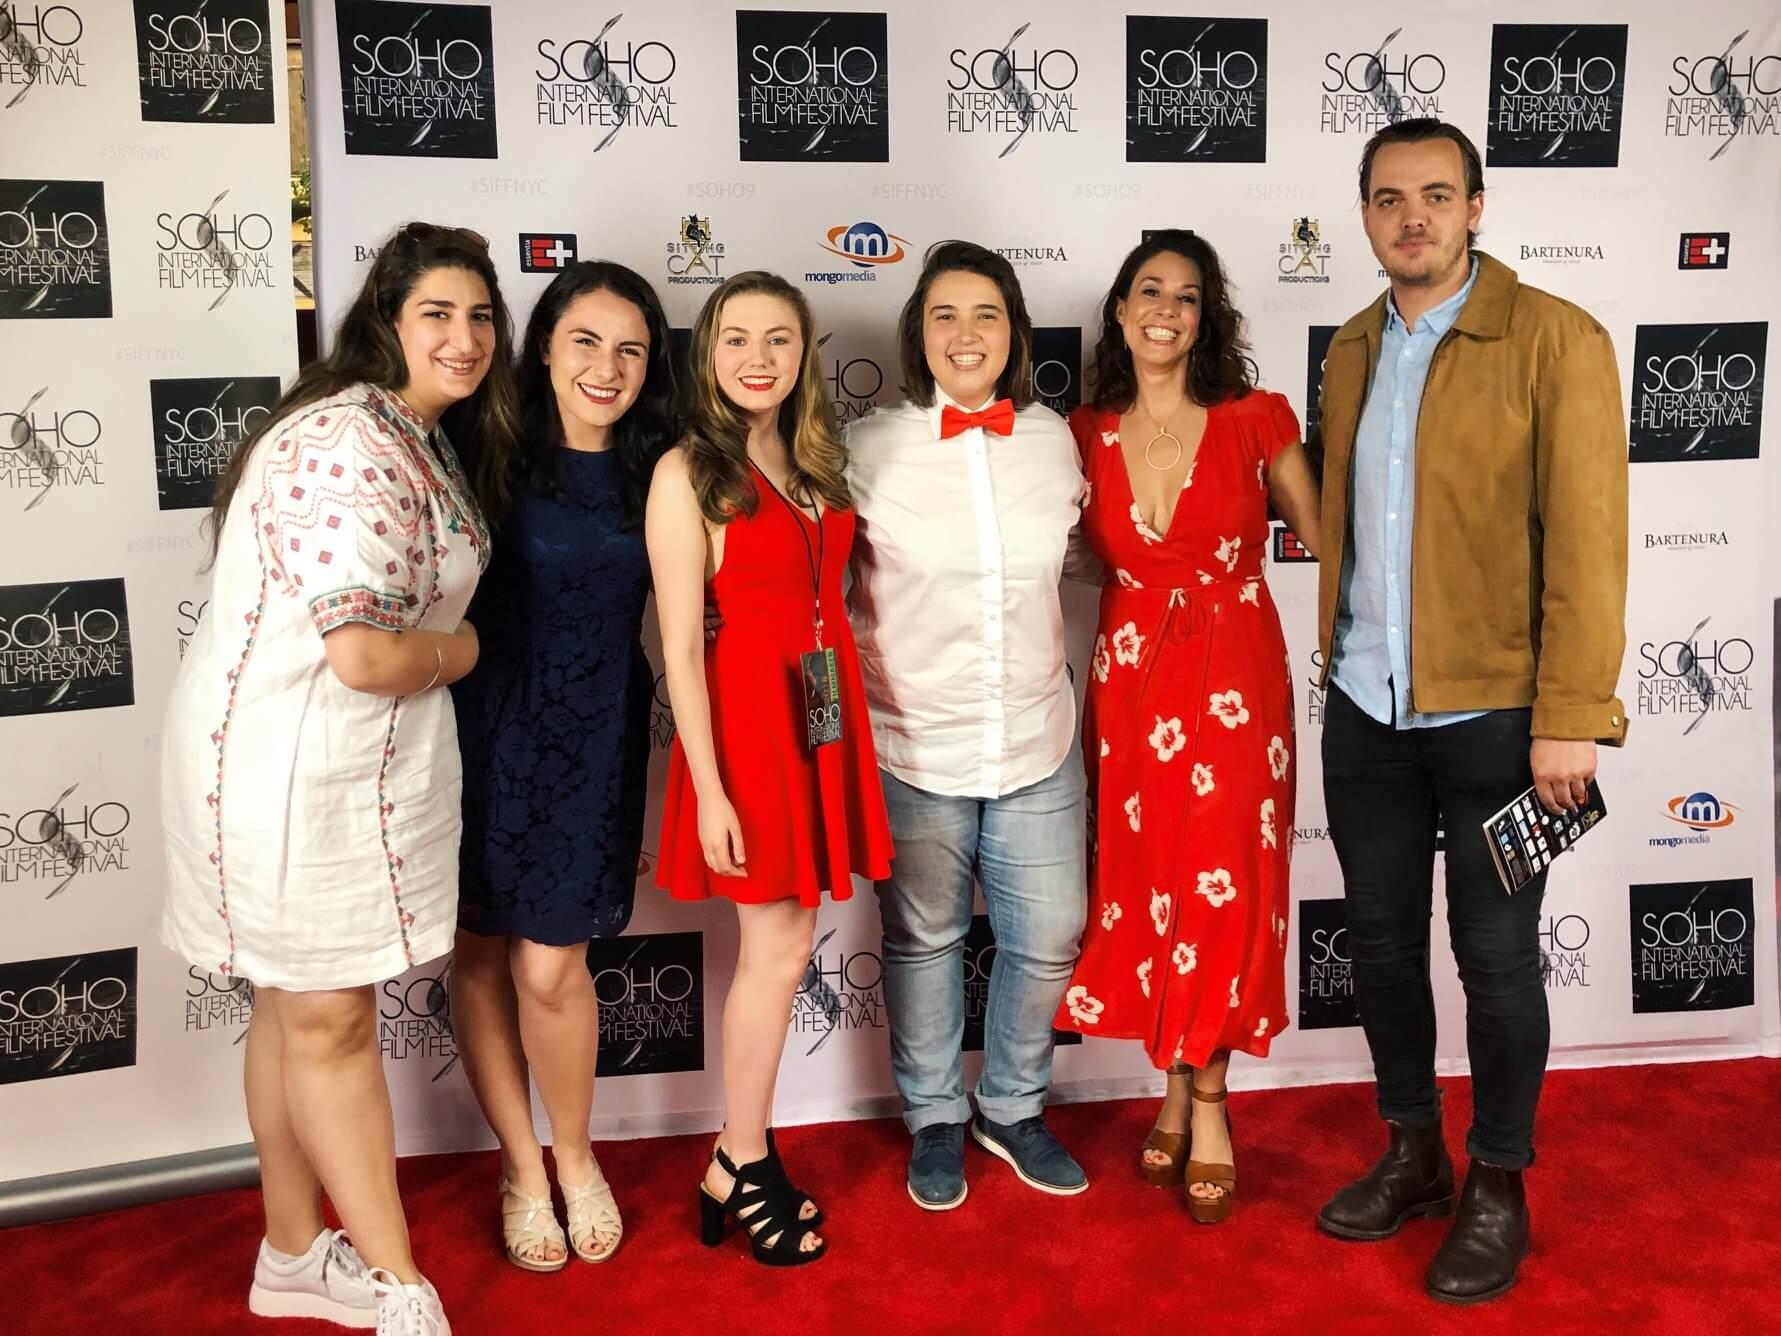 Soho International Film Festival - Jolie Curtsinger & The Perfect Fit Cast